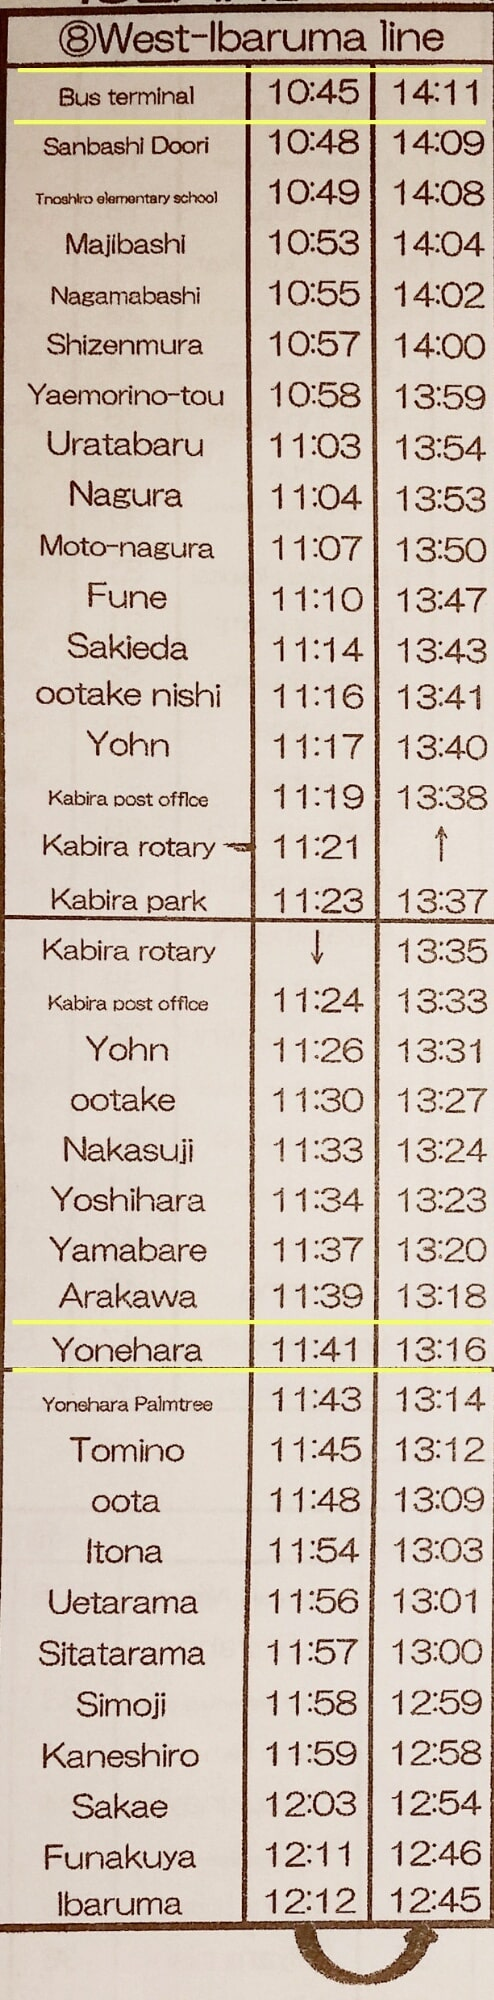 Yonehara Beach from ishigaki bus terminal bus timings. Backpacking Okinawa Japan